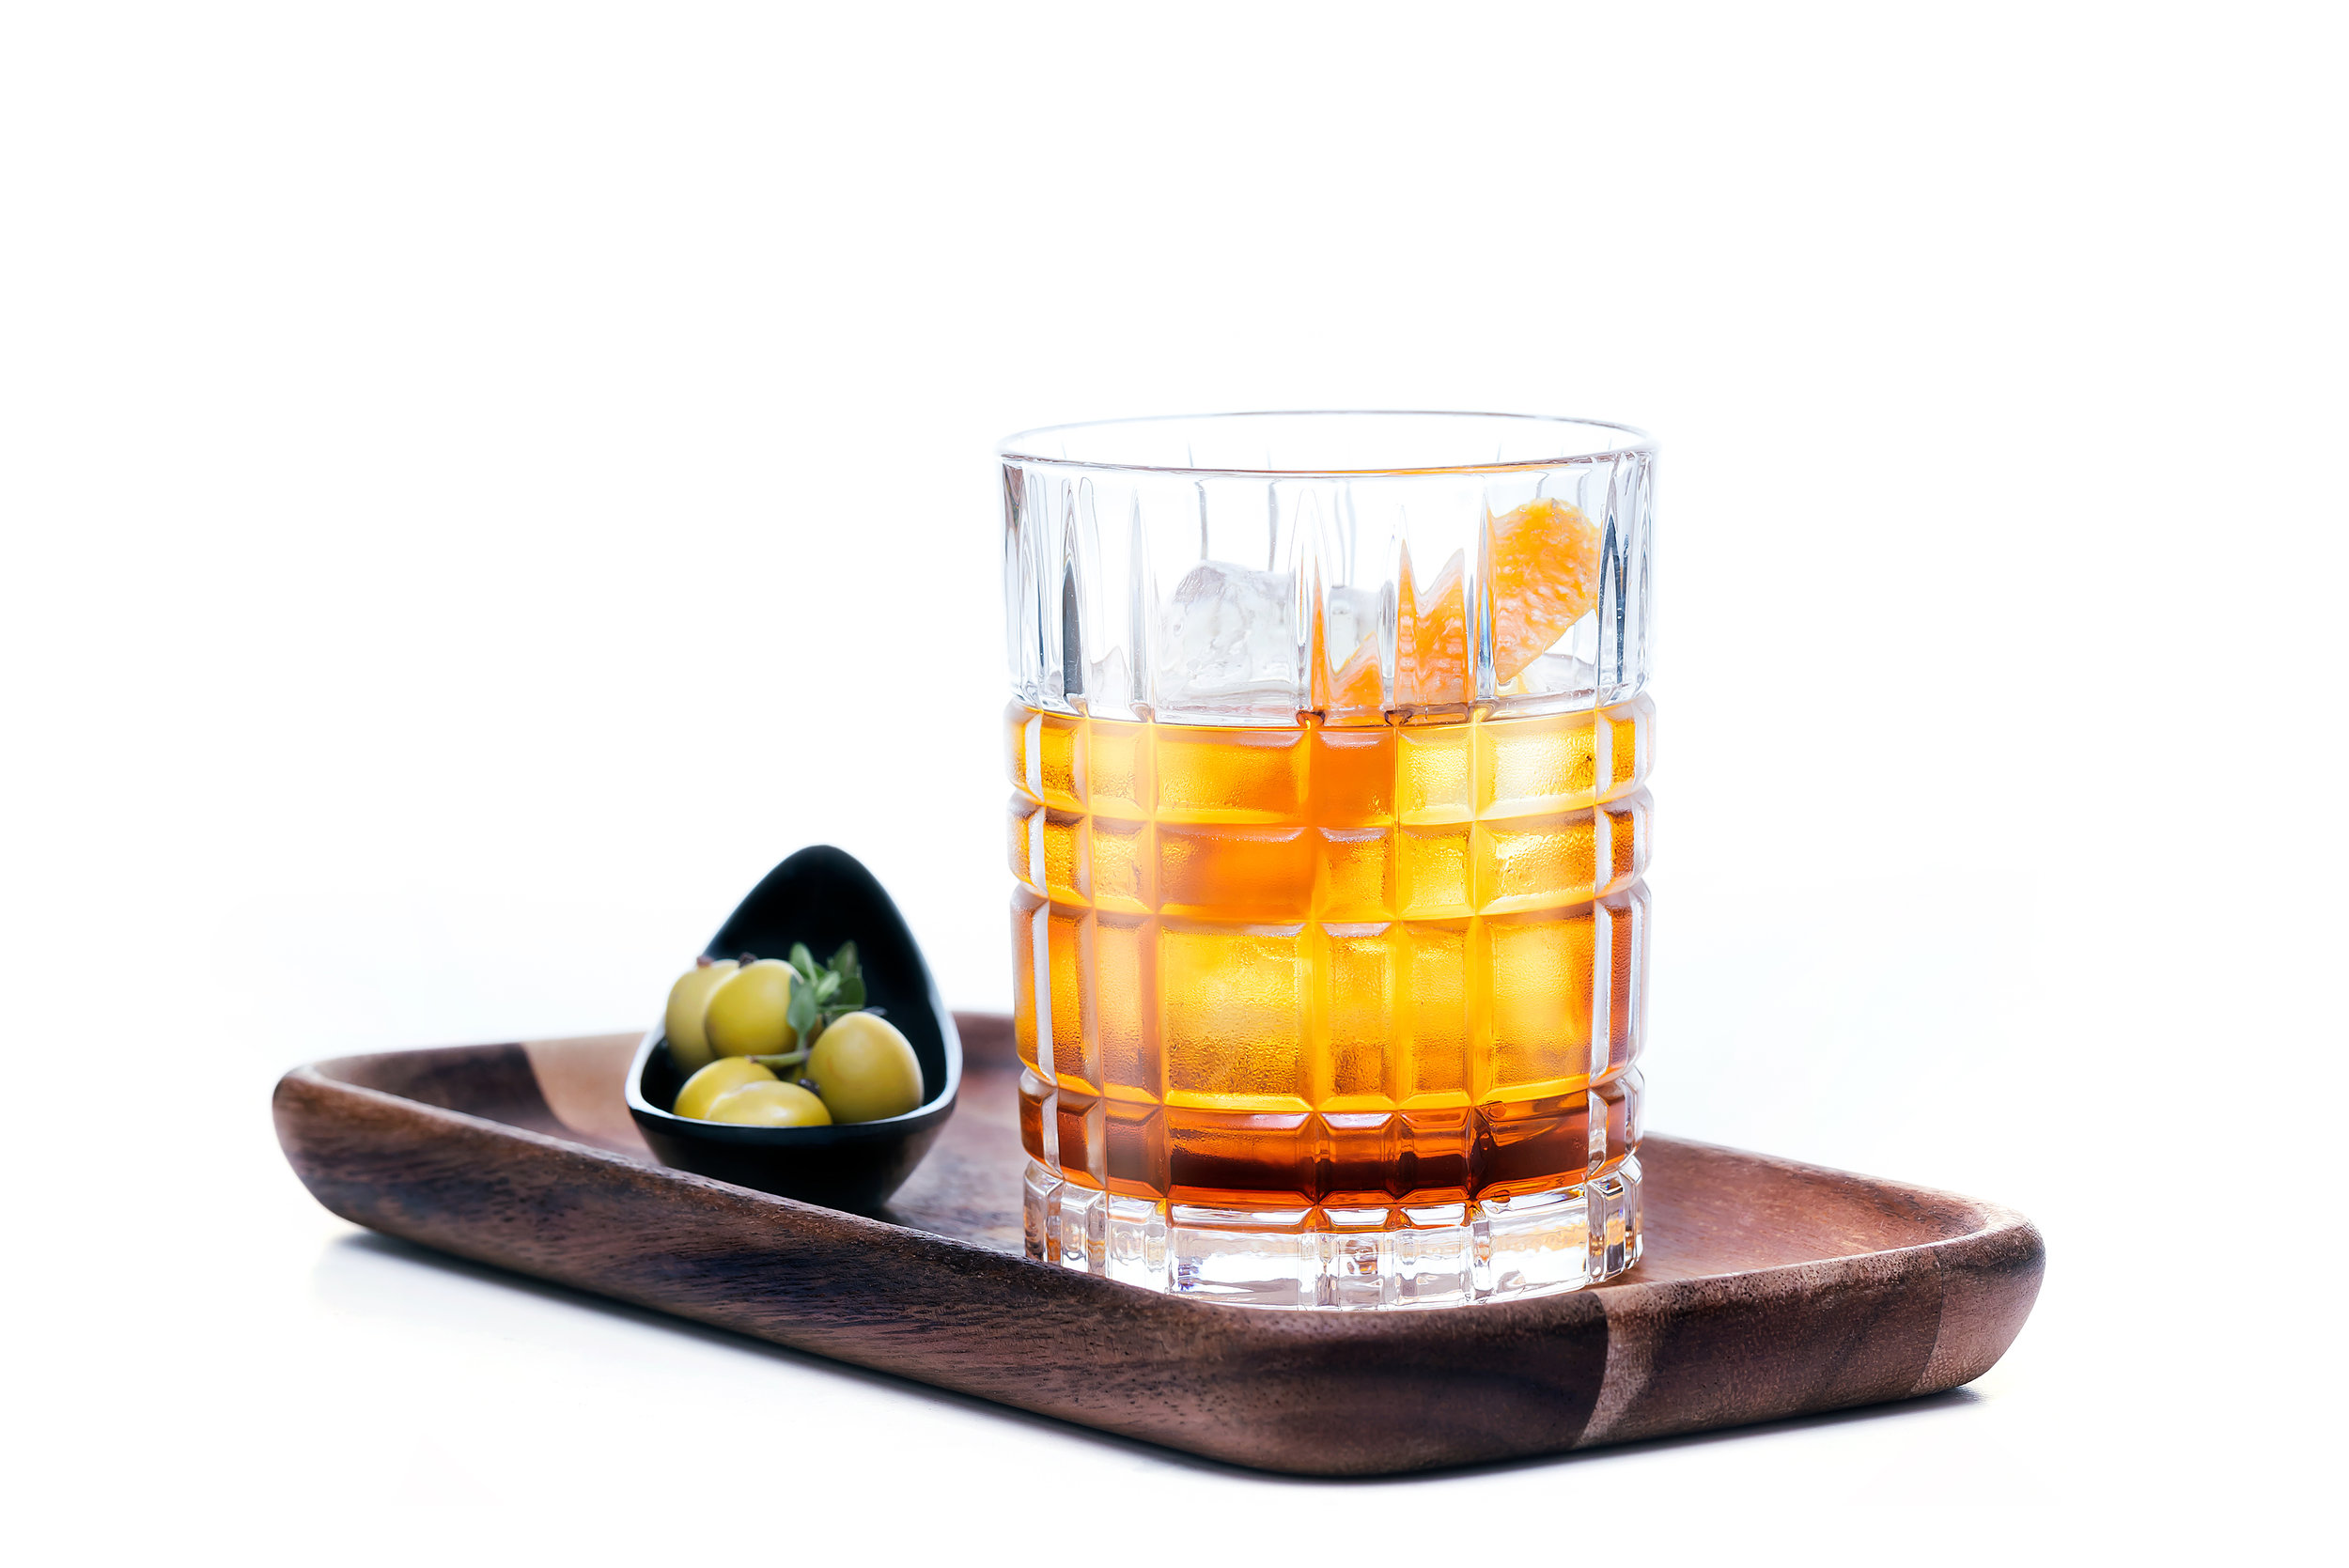 bebidas-drinks-cocktails-cocteles-photographer-fotografo-photography-fotografia-mixology-bartending-La-Sole-del-Pimpi-Malaga-Sr-Erreka-Photo-diego-erreka-shakti-de-raco-españa-spain-advertising-publicidad.jpg